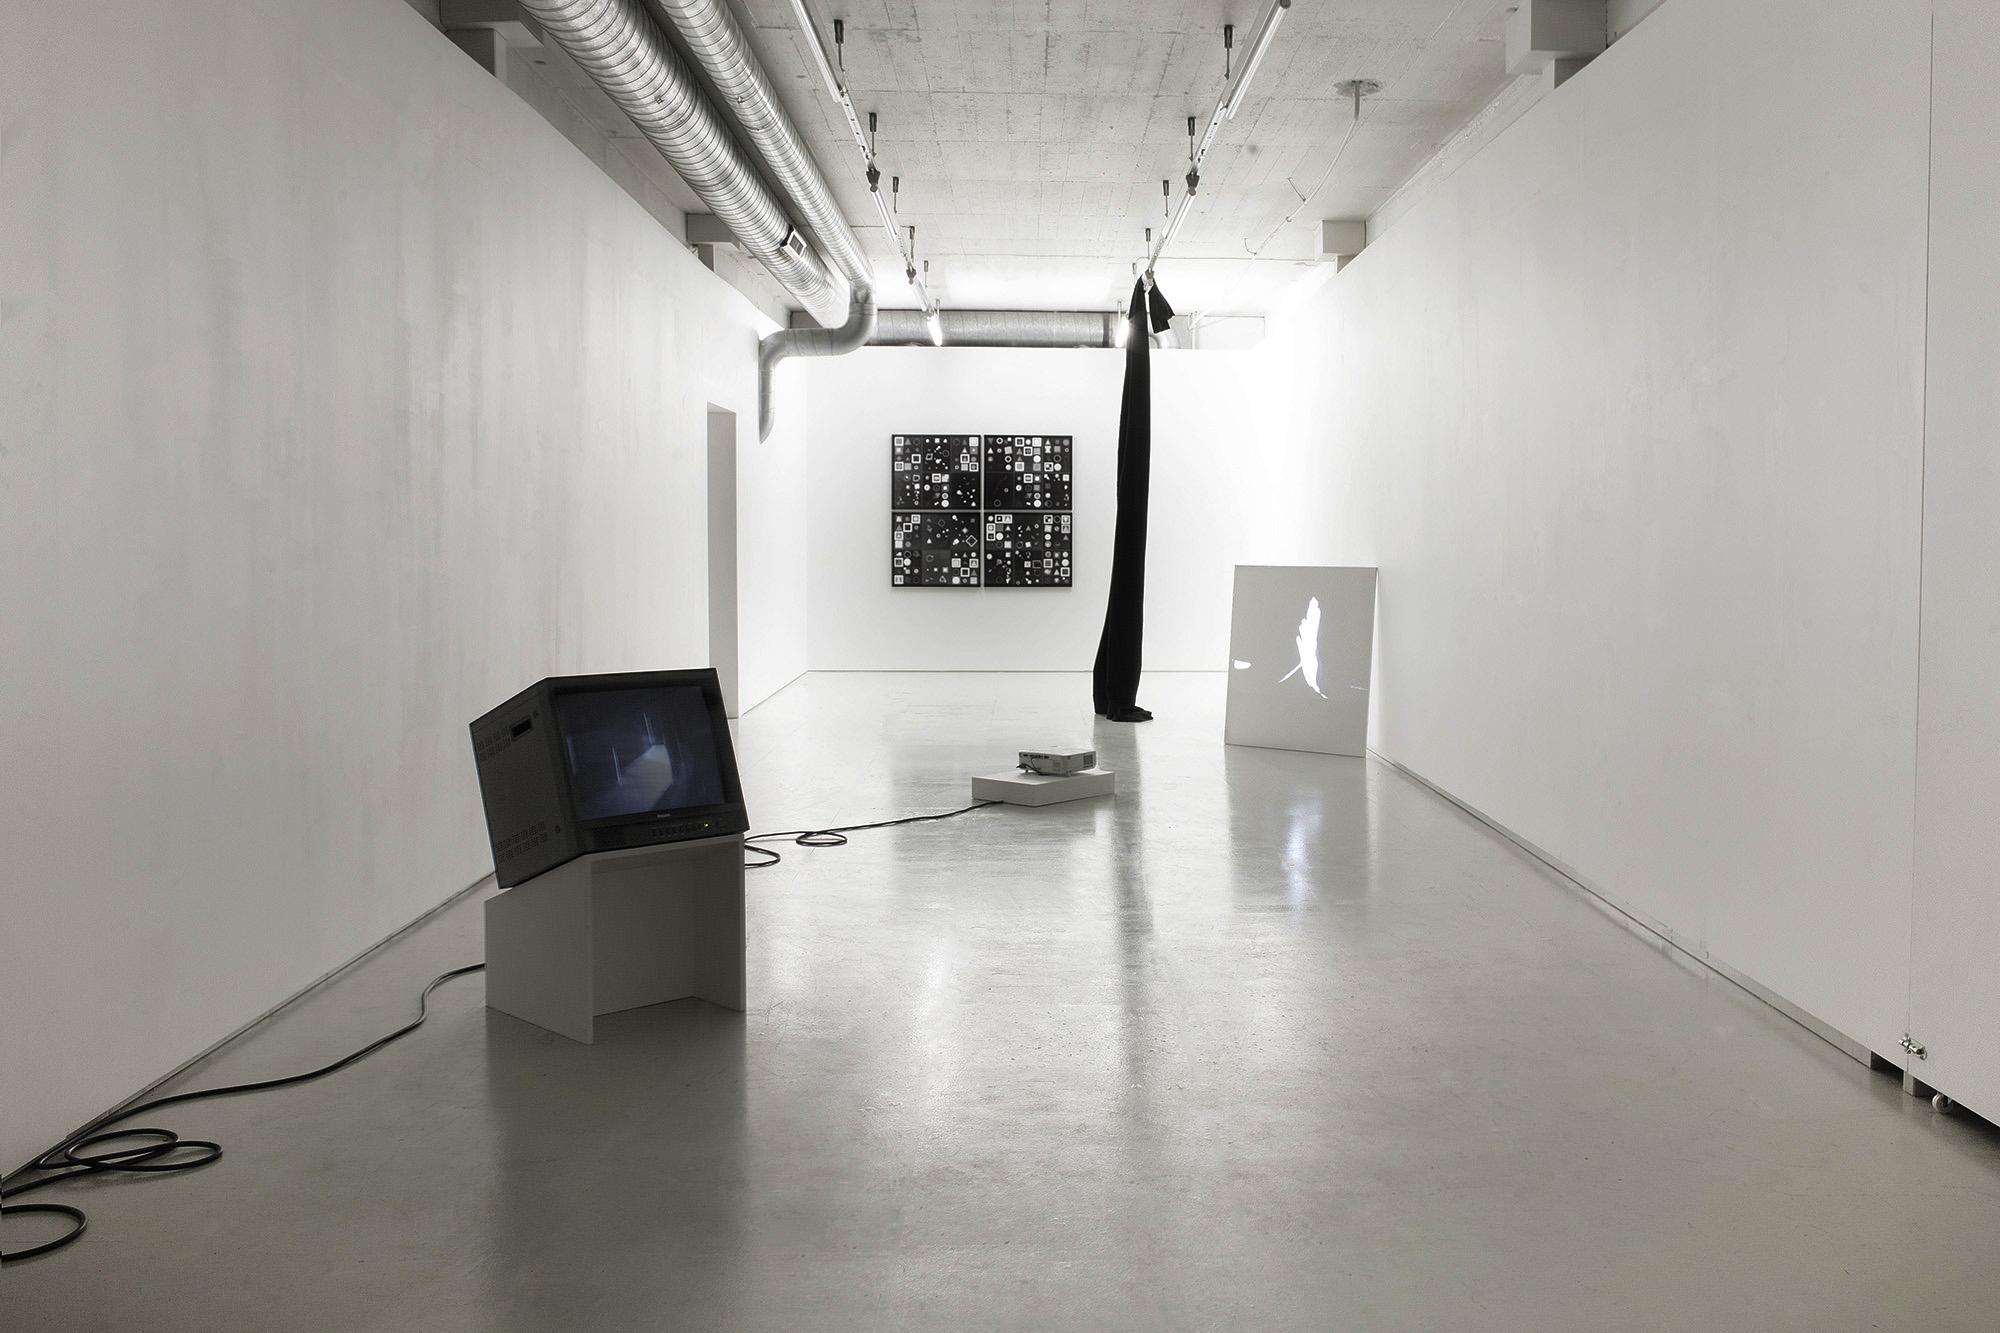 Emil Salto - Untitled Drama - Installation view